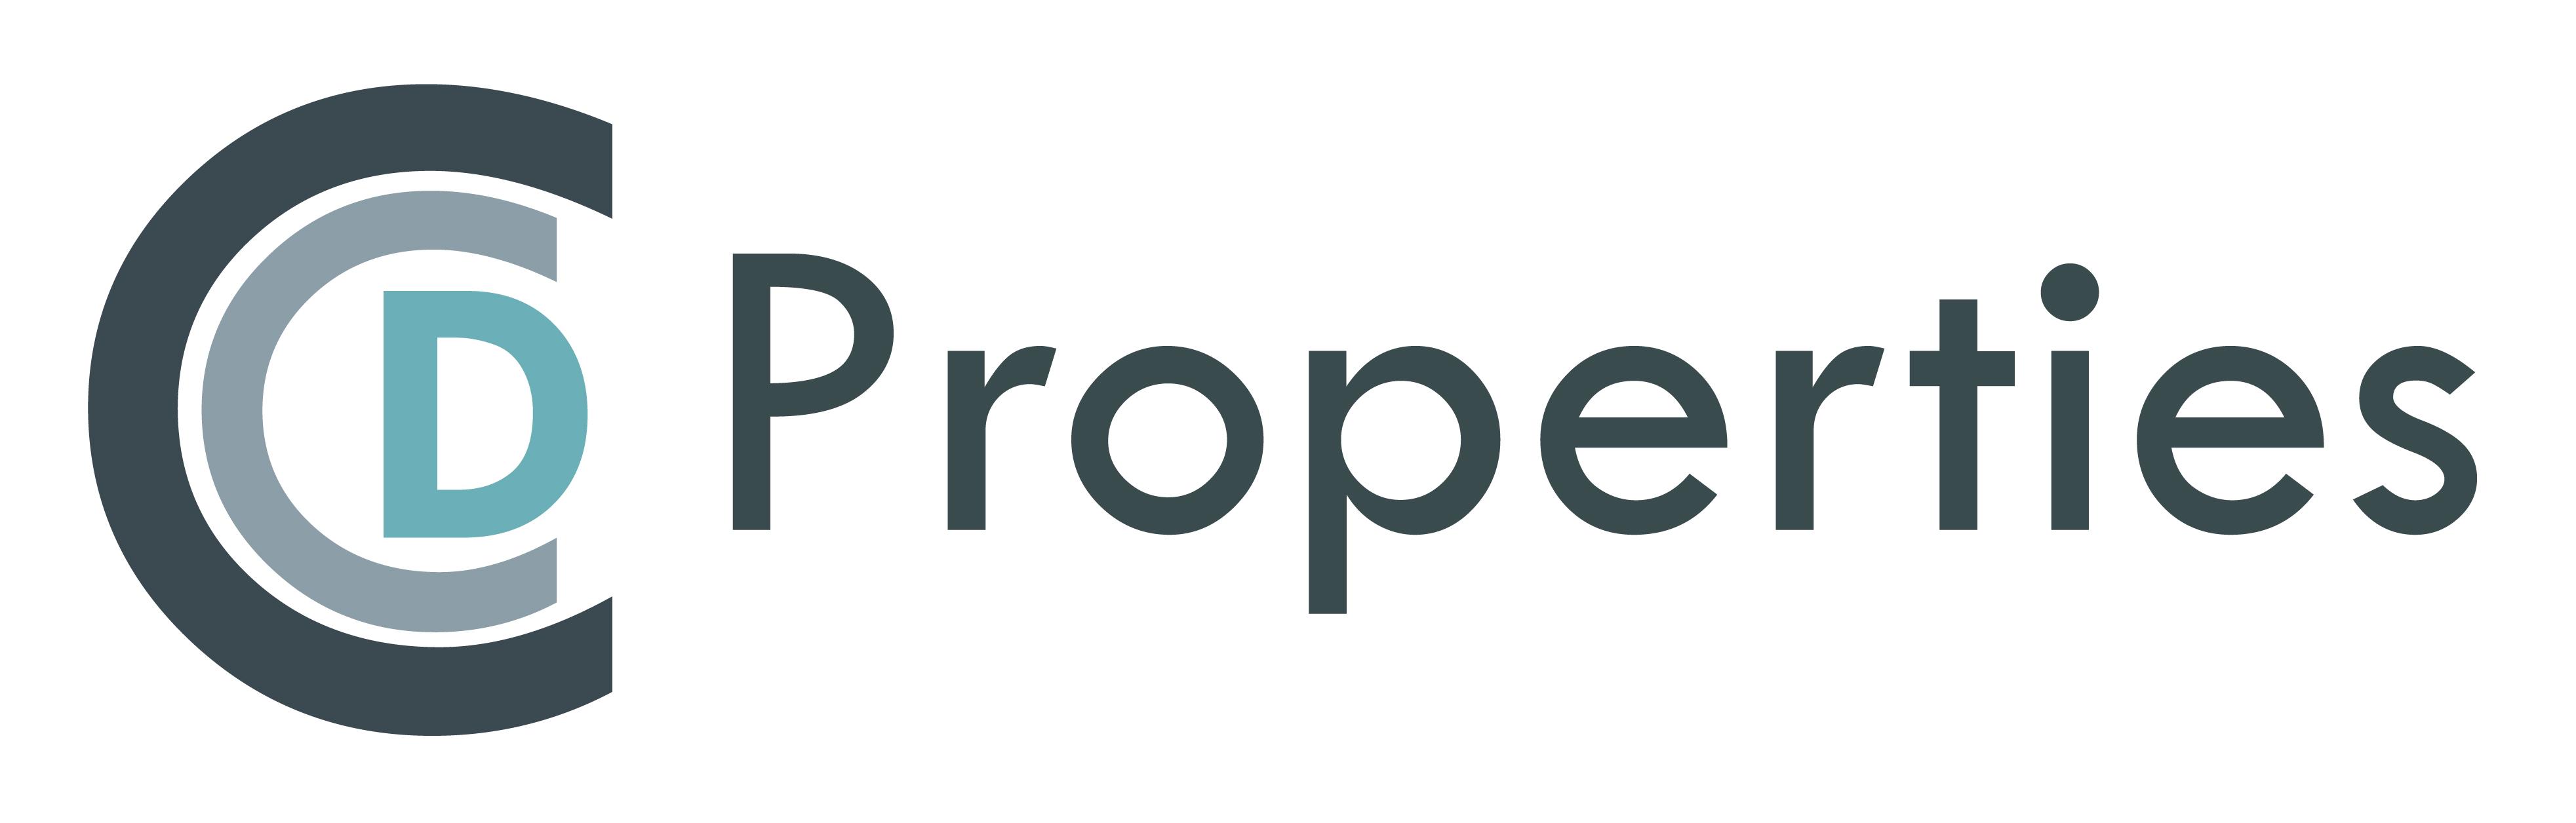 ccd properties logo